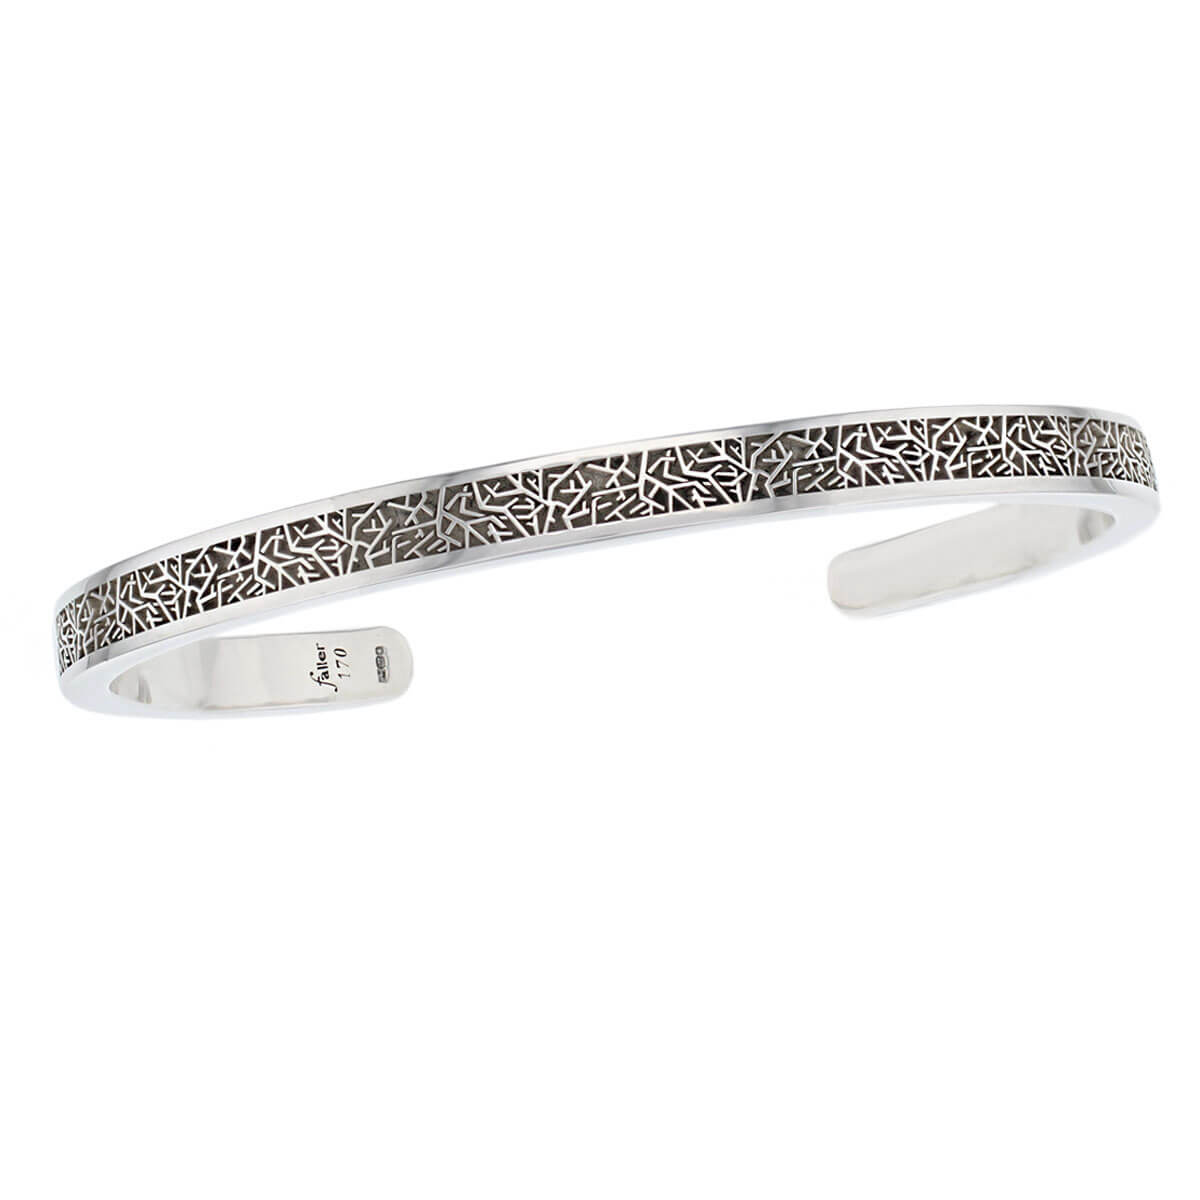 Faller solid sterling silver torc bangle, torque, torq, men's jewellery,twig pattern, wrist wear, personalised engraving, handmade, designer